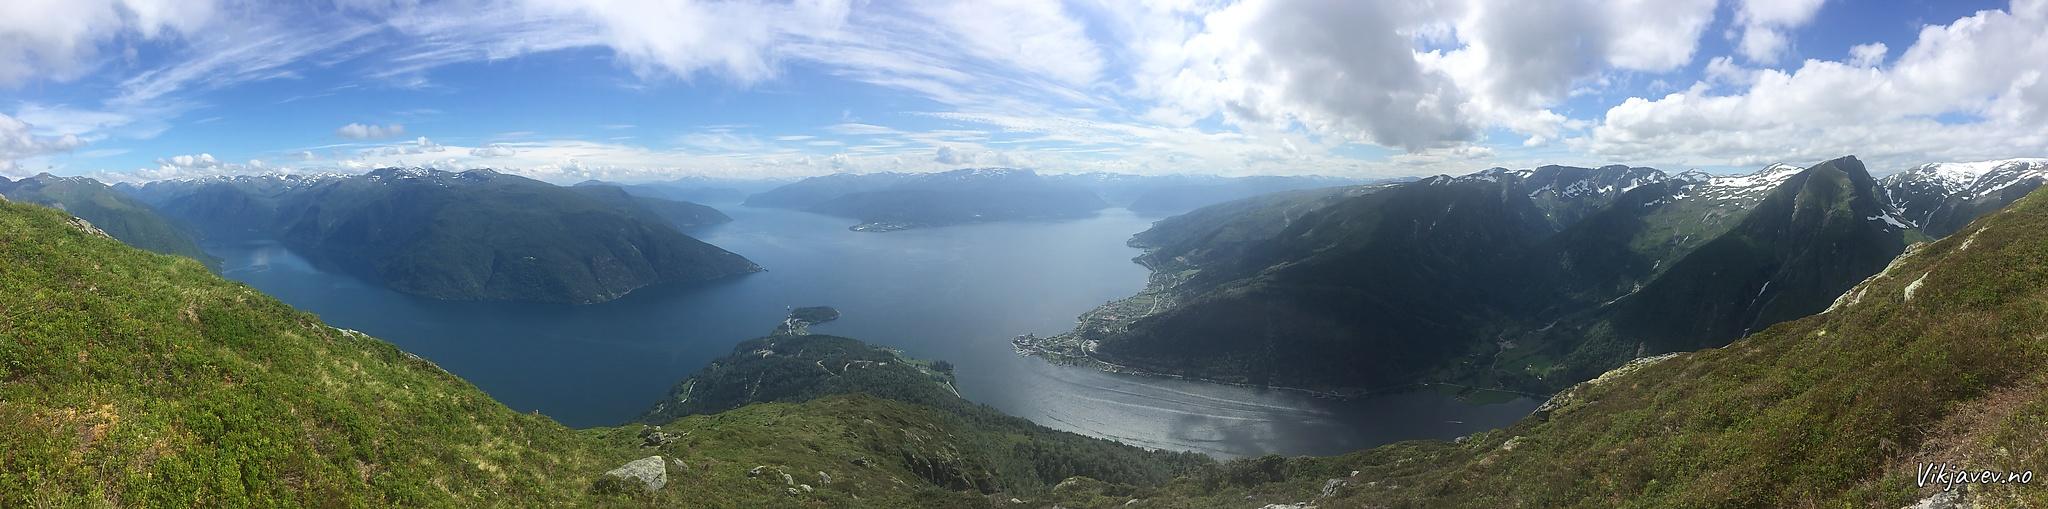 Panorama frå Tjuatoten